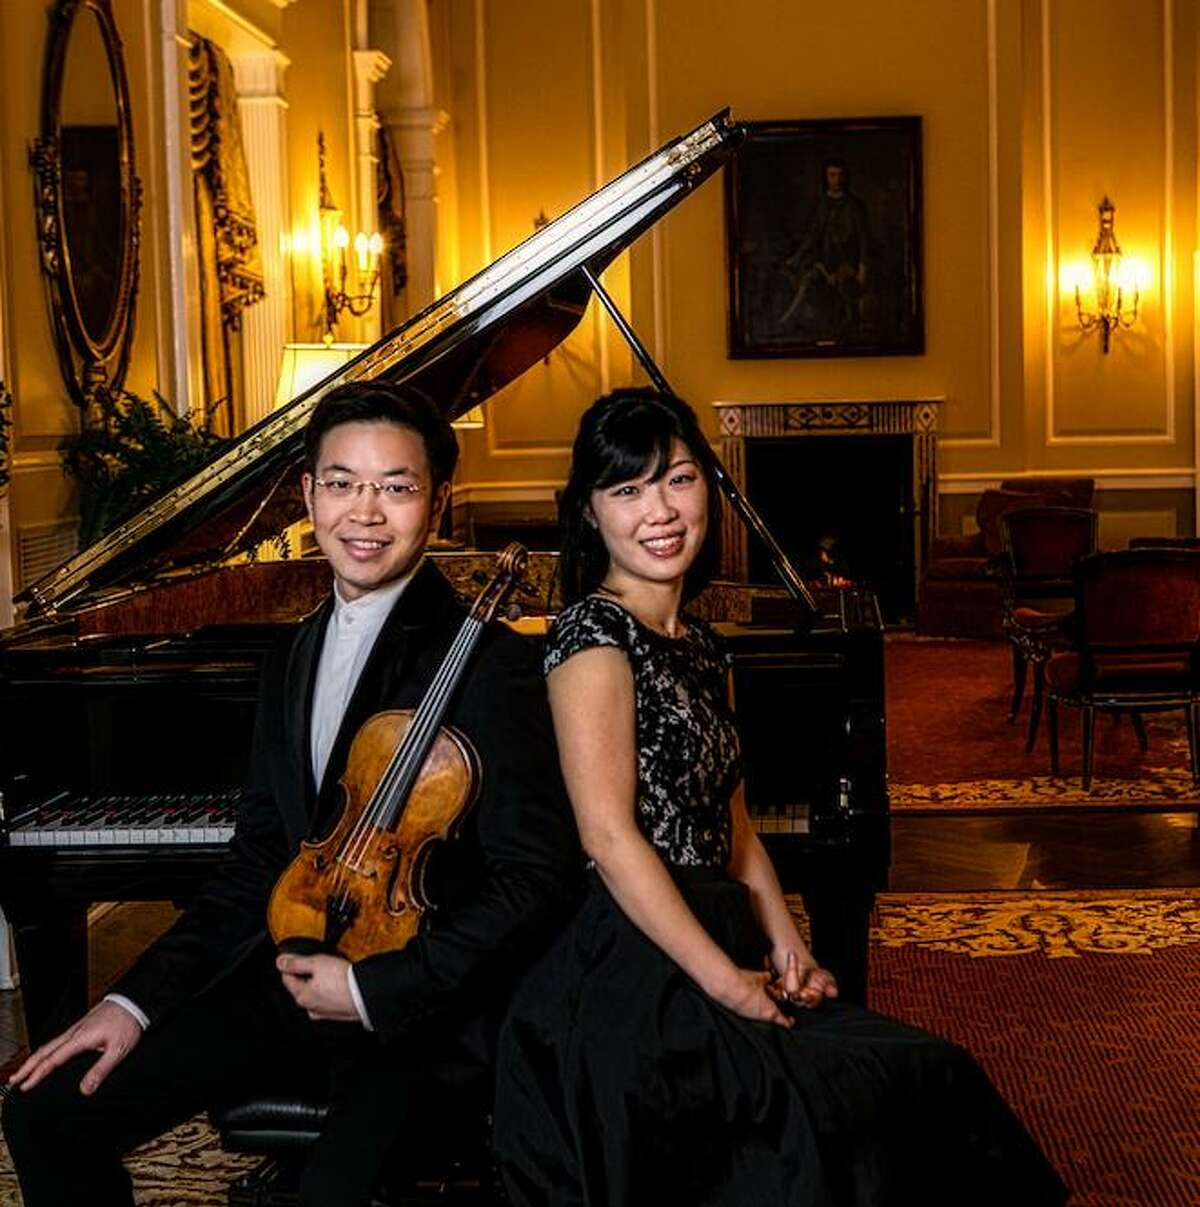 Violinist Helen Huang and pianist Paul Huang. (credit: John Kringas)